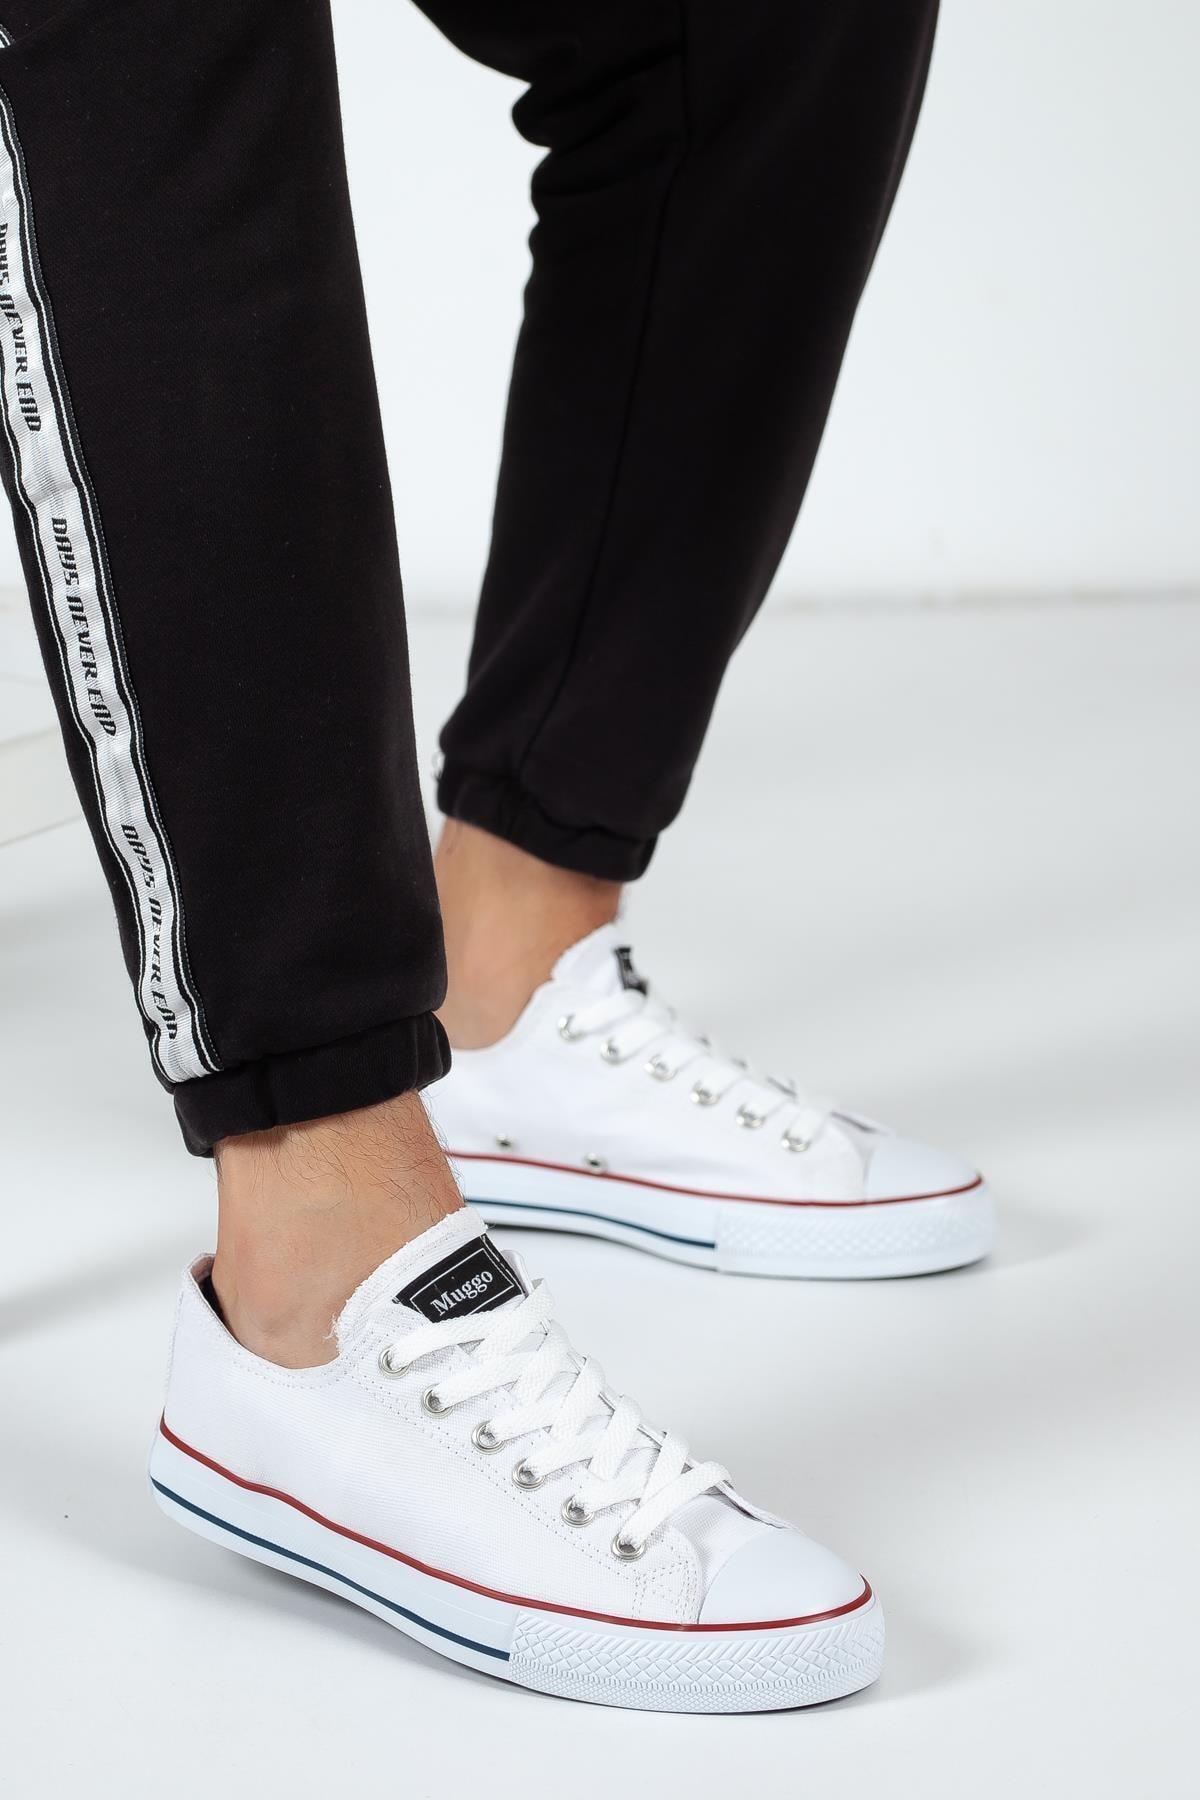 MUGGO Crs35 Keten Unisex Sneaker 2